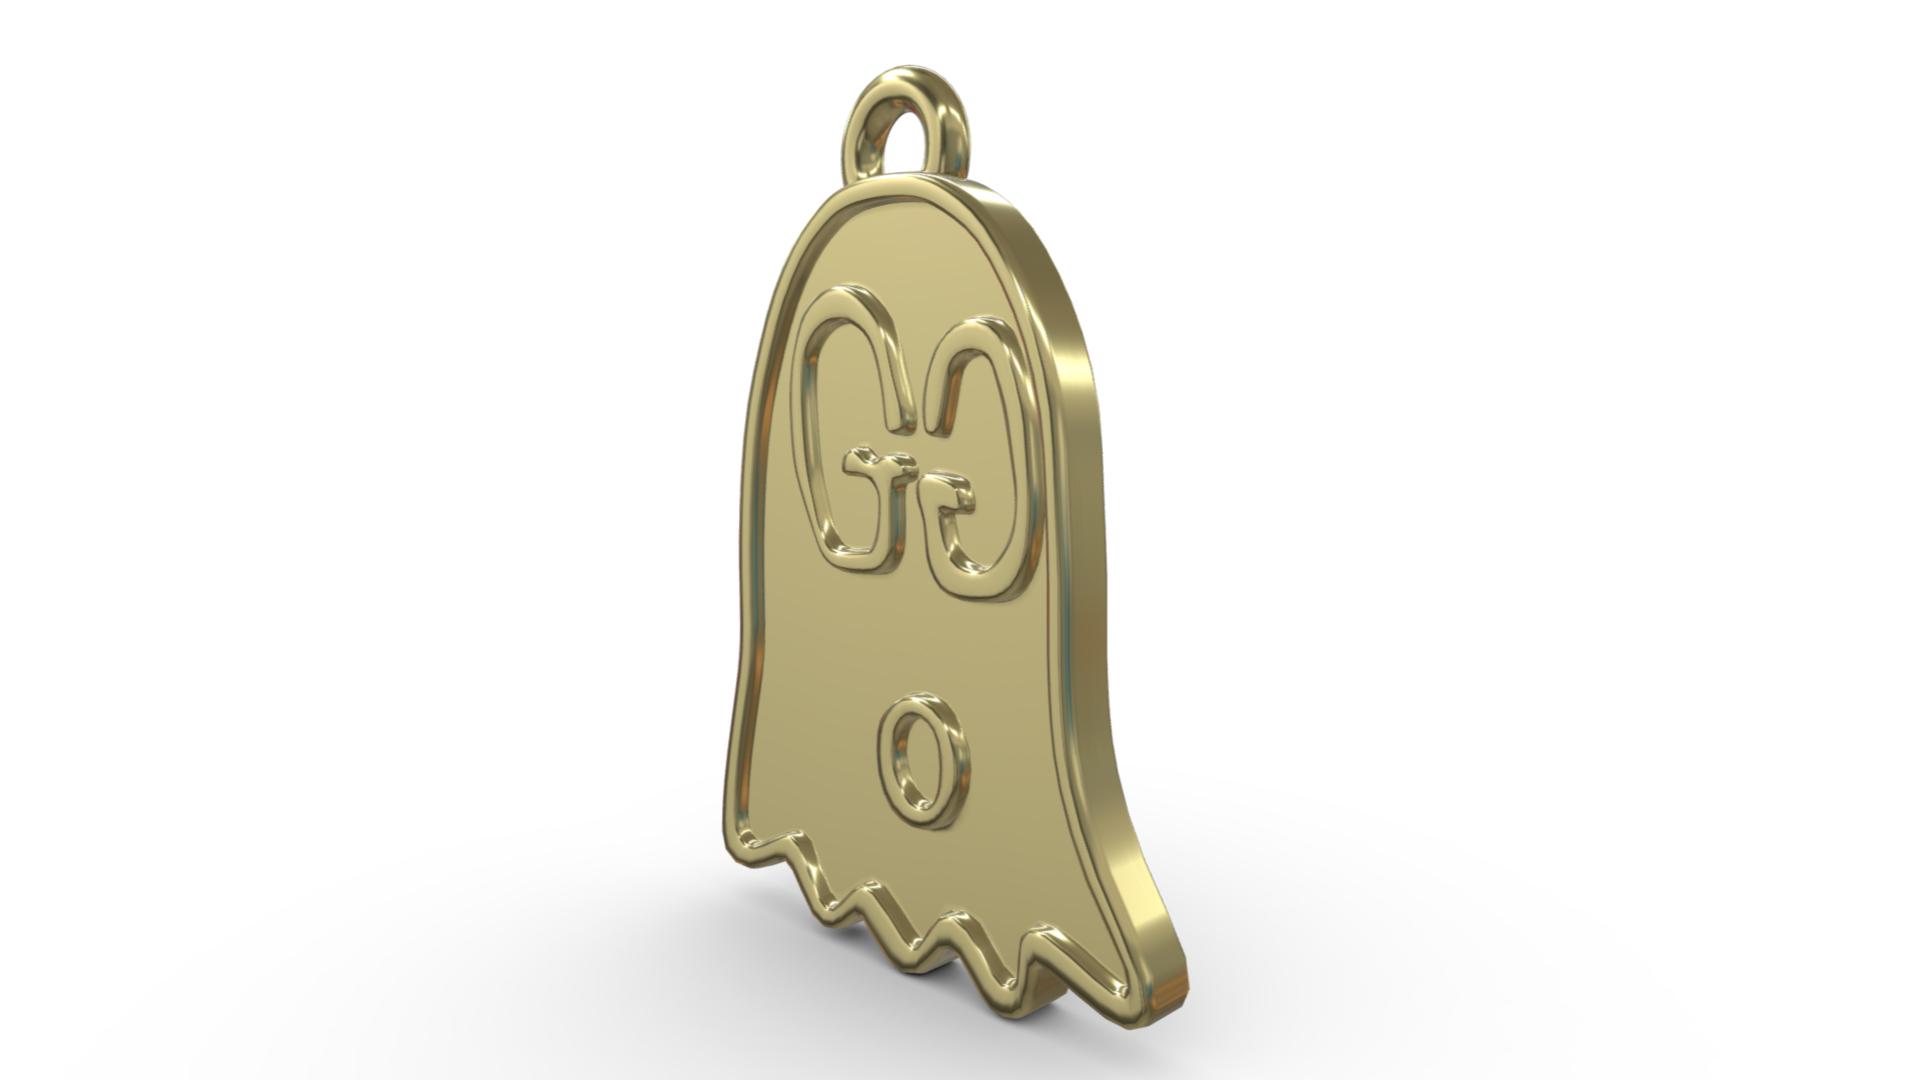 06b7fdea8 Gucci pendant 2 - 3DOcean Item for Sale. 1.jpg 10.jpg 2.jpg ...